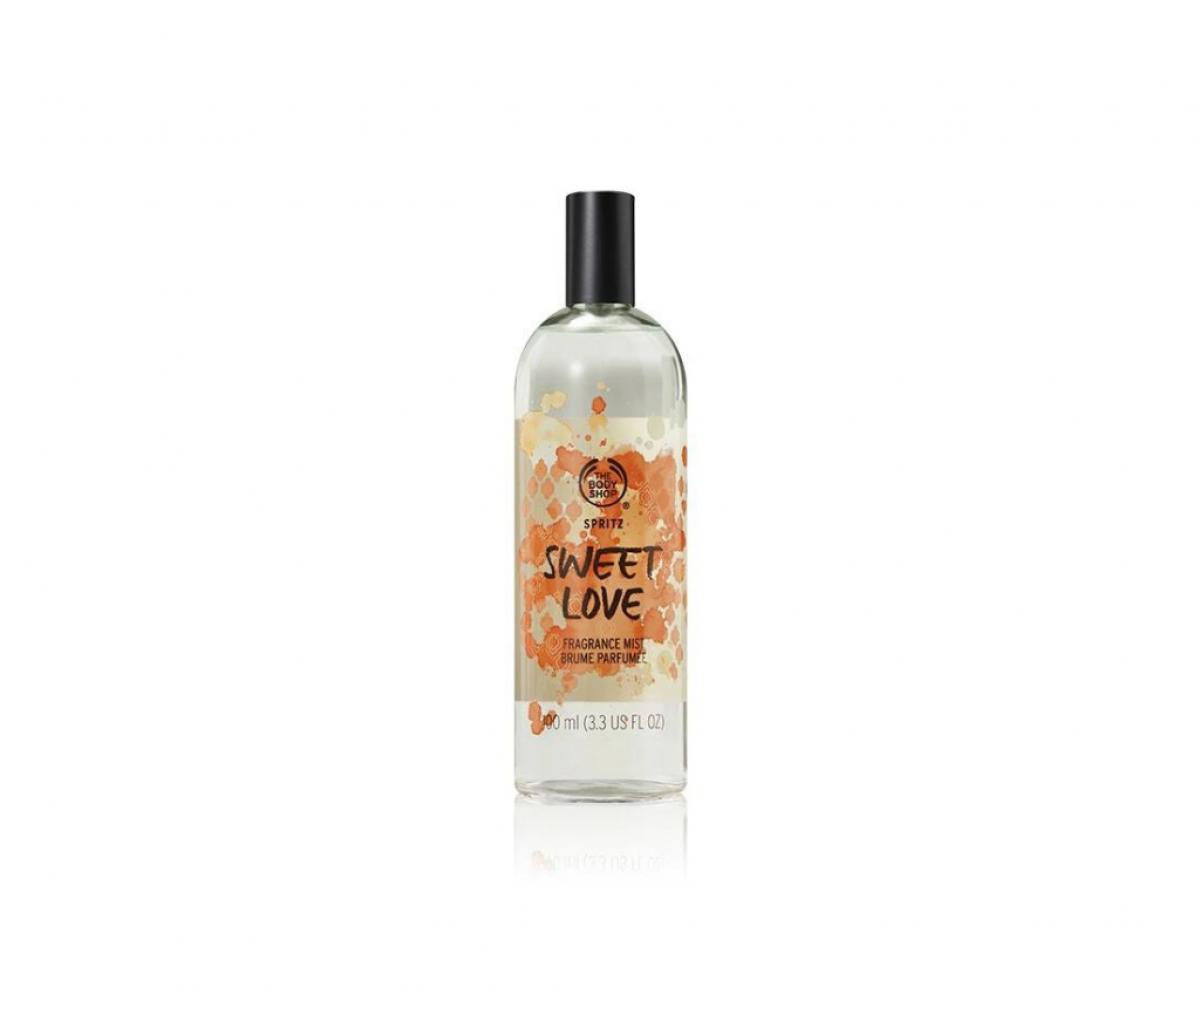 The Body Shop SOL Spritz Sweet Love Fragrance Mist 100ml